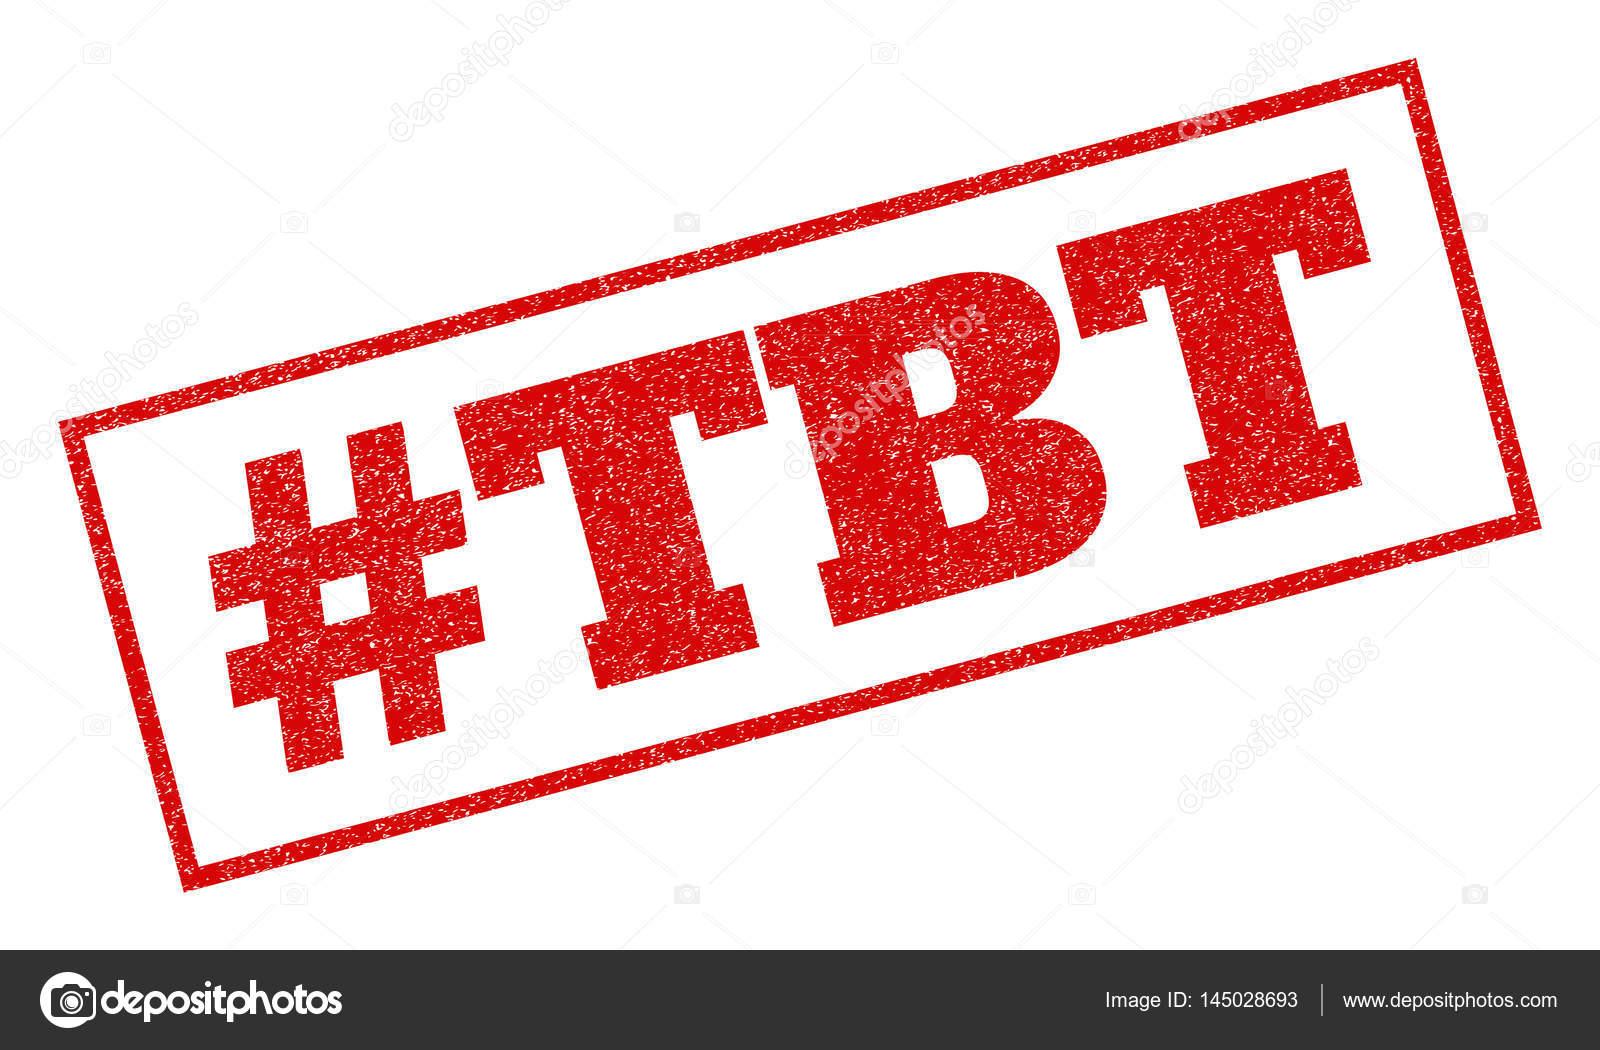 Hashtag Tbt Rubber Stamp \u2014 Stock Vector © tatyana.sibcode.com #145028693